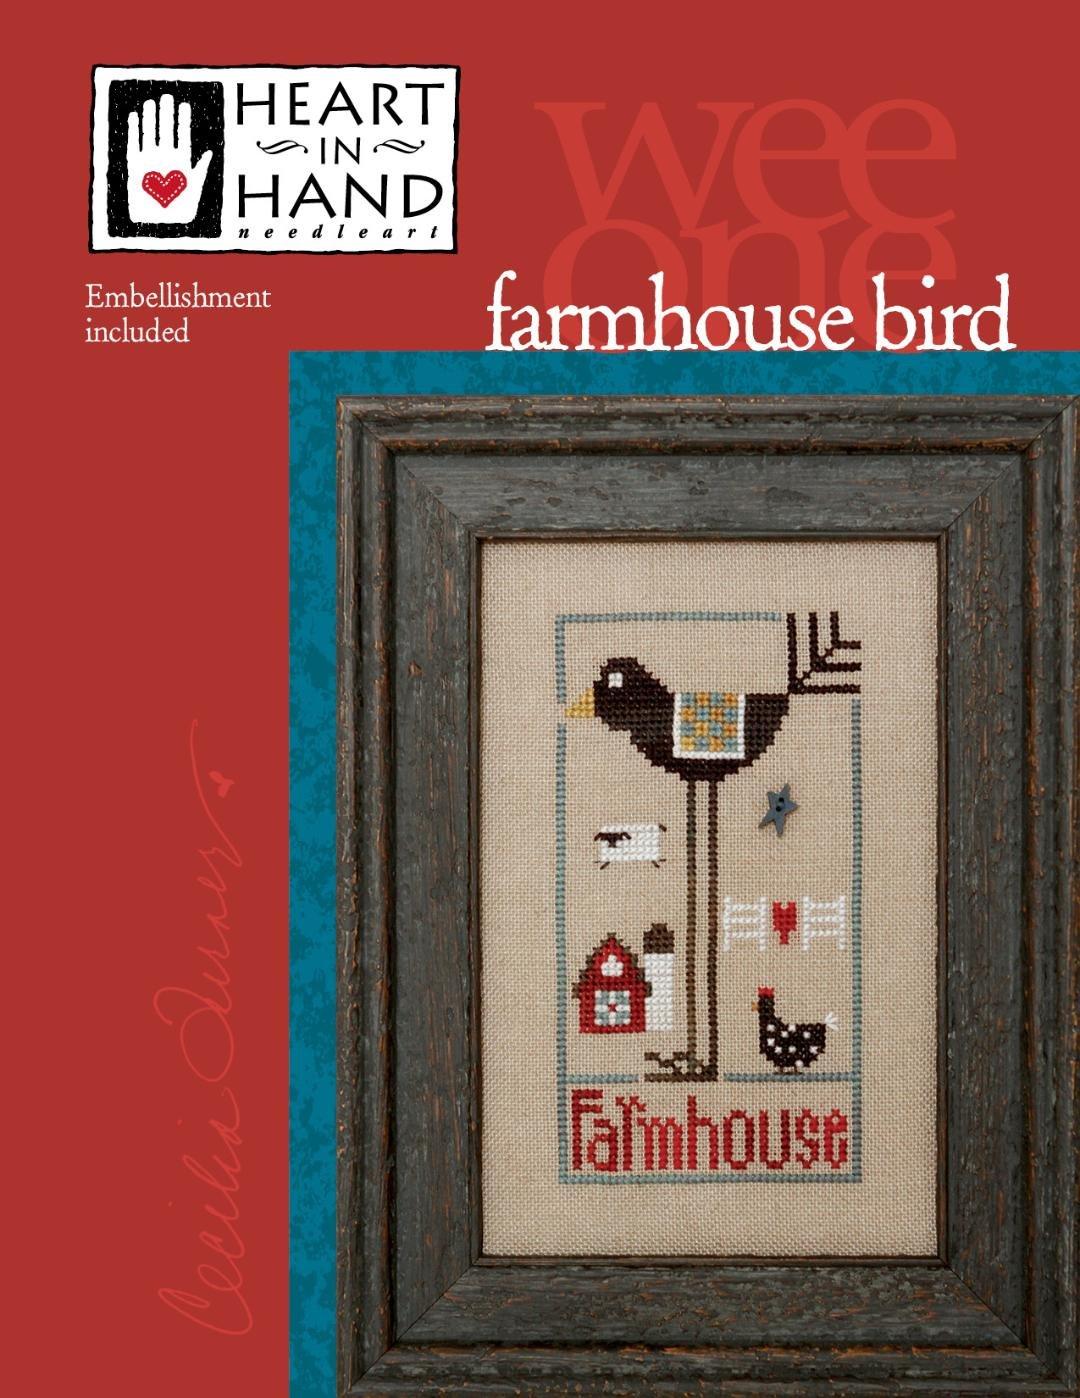 Heart in Hand - Farmhouse Bird